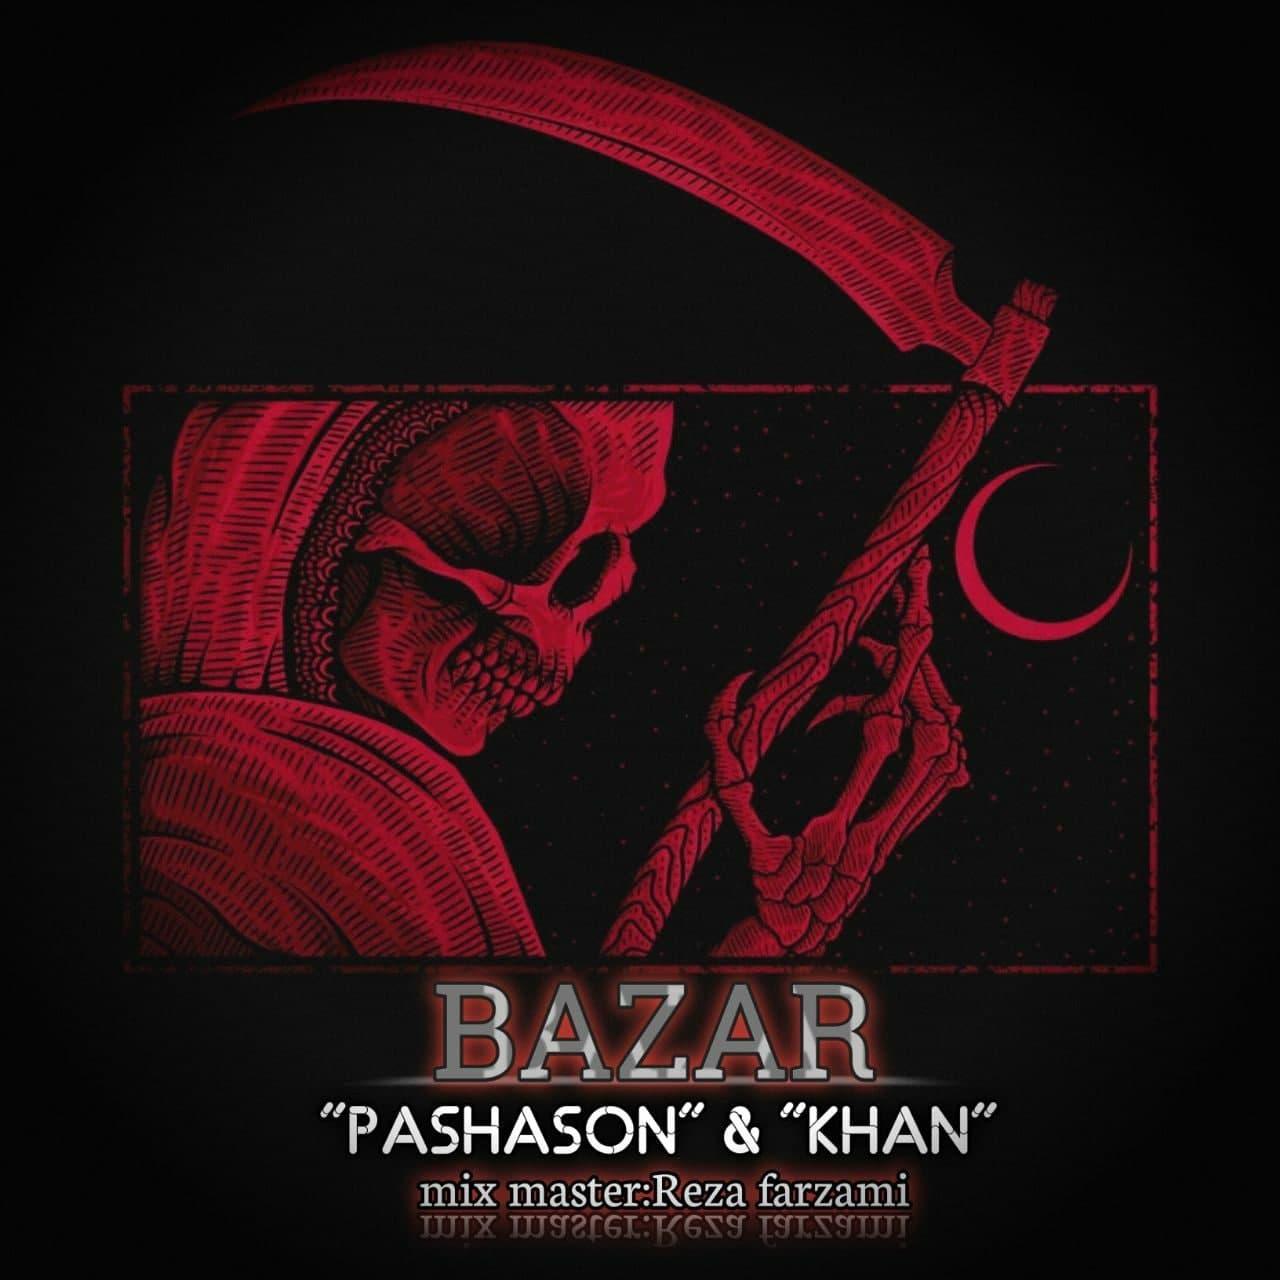 https://s18.picofile.com/file/8438486392/18Pashason_Ft_Khan_Bazar.jpg